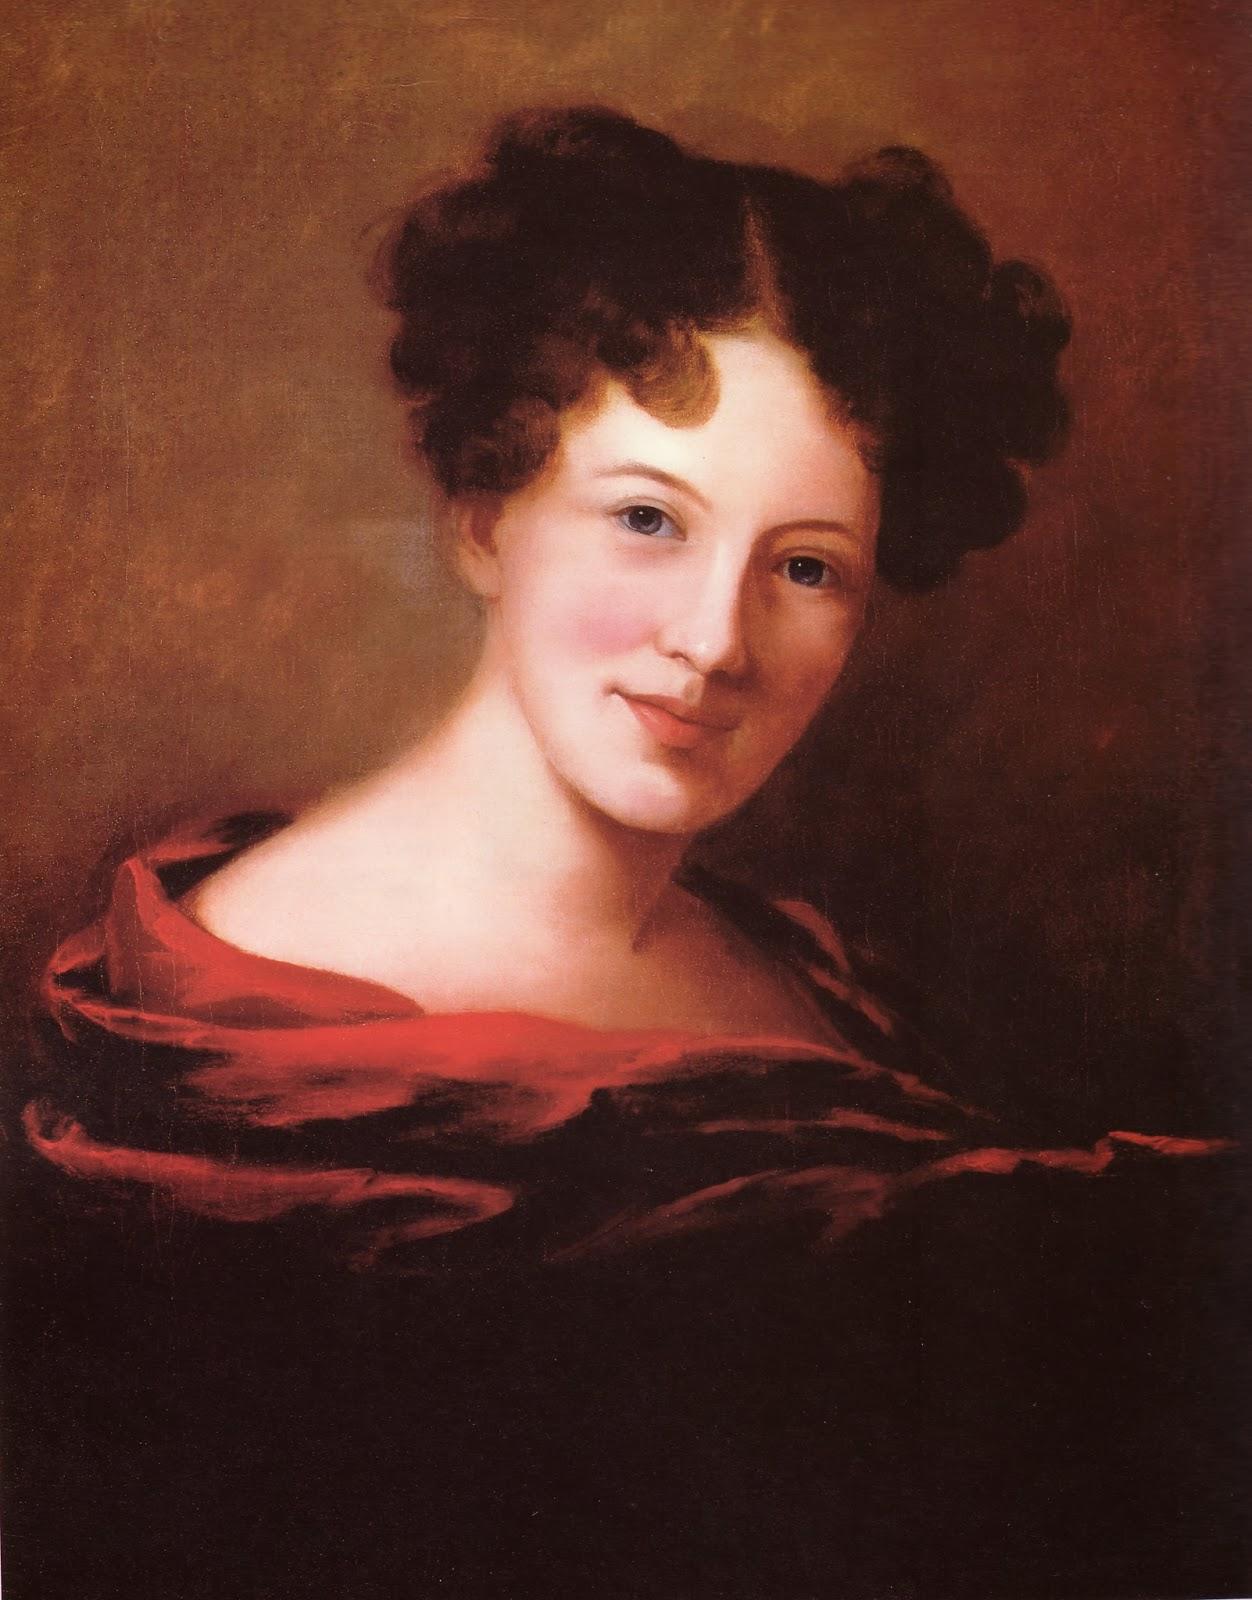 Autoportrait (1818) Sarah Miriam Peale